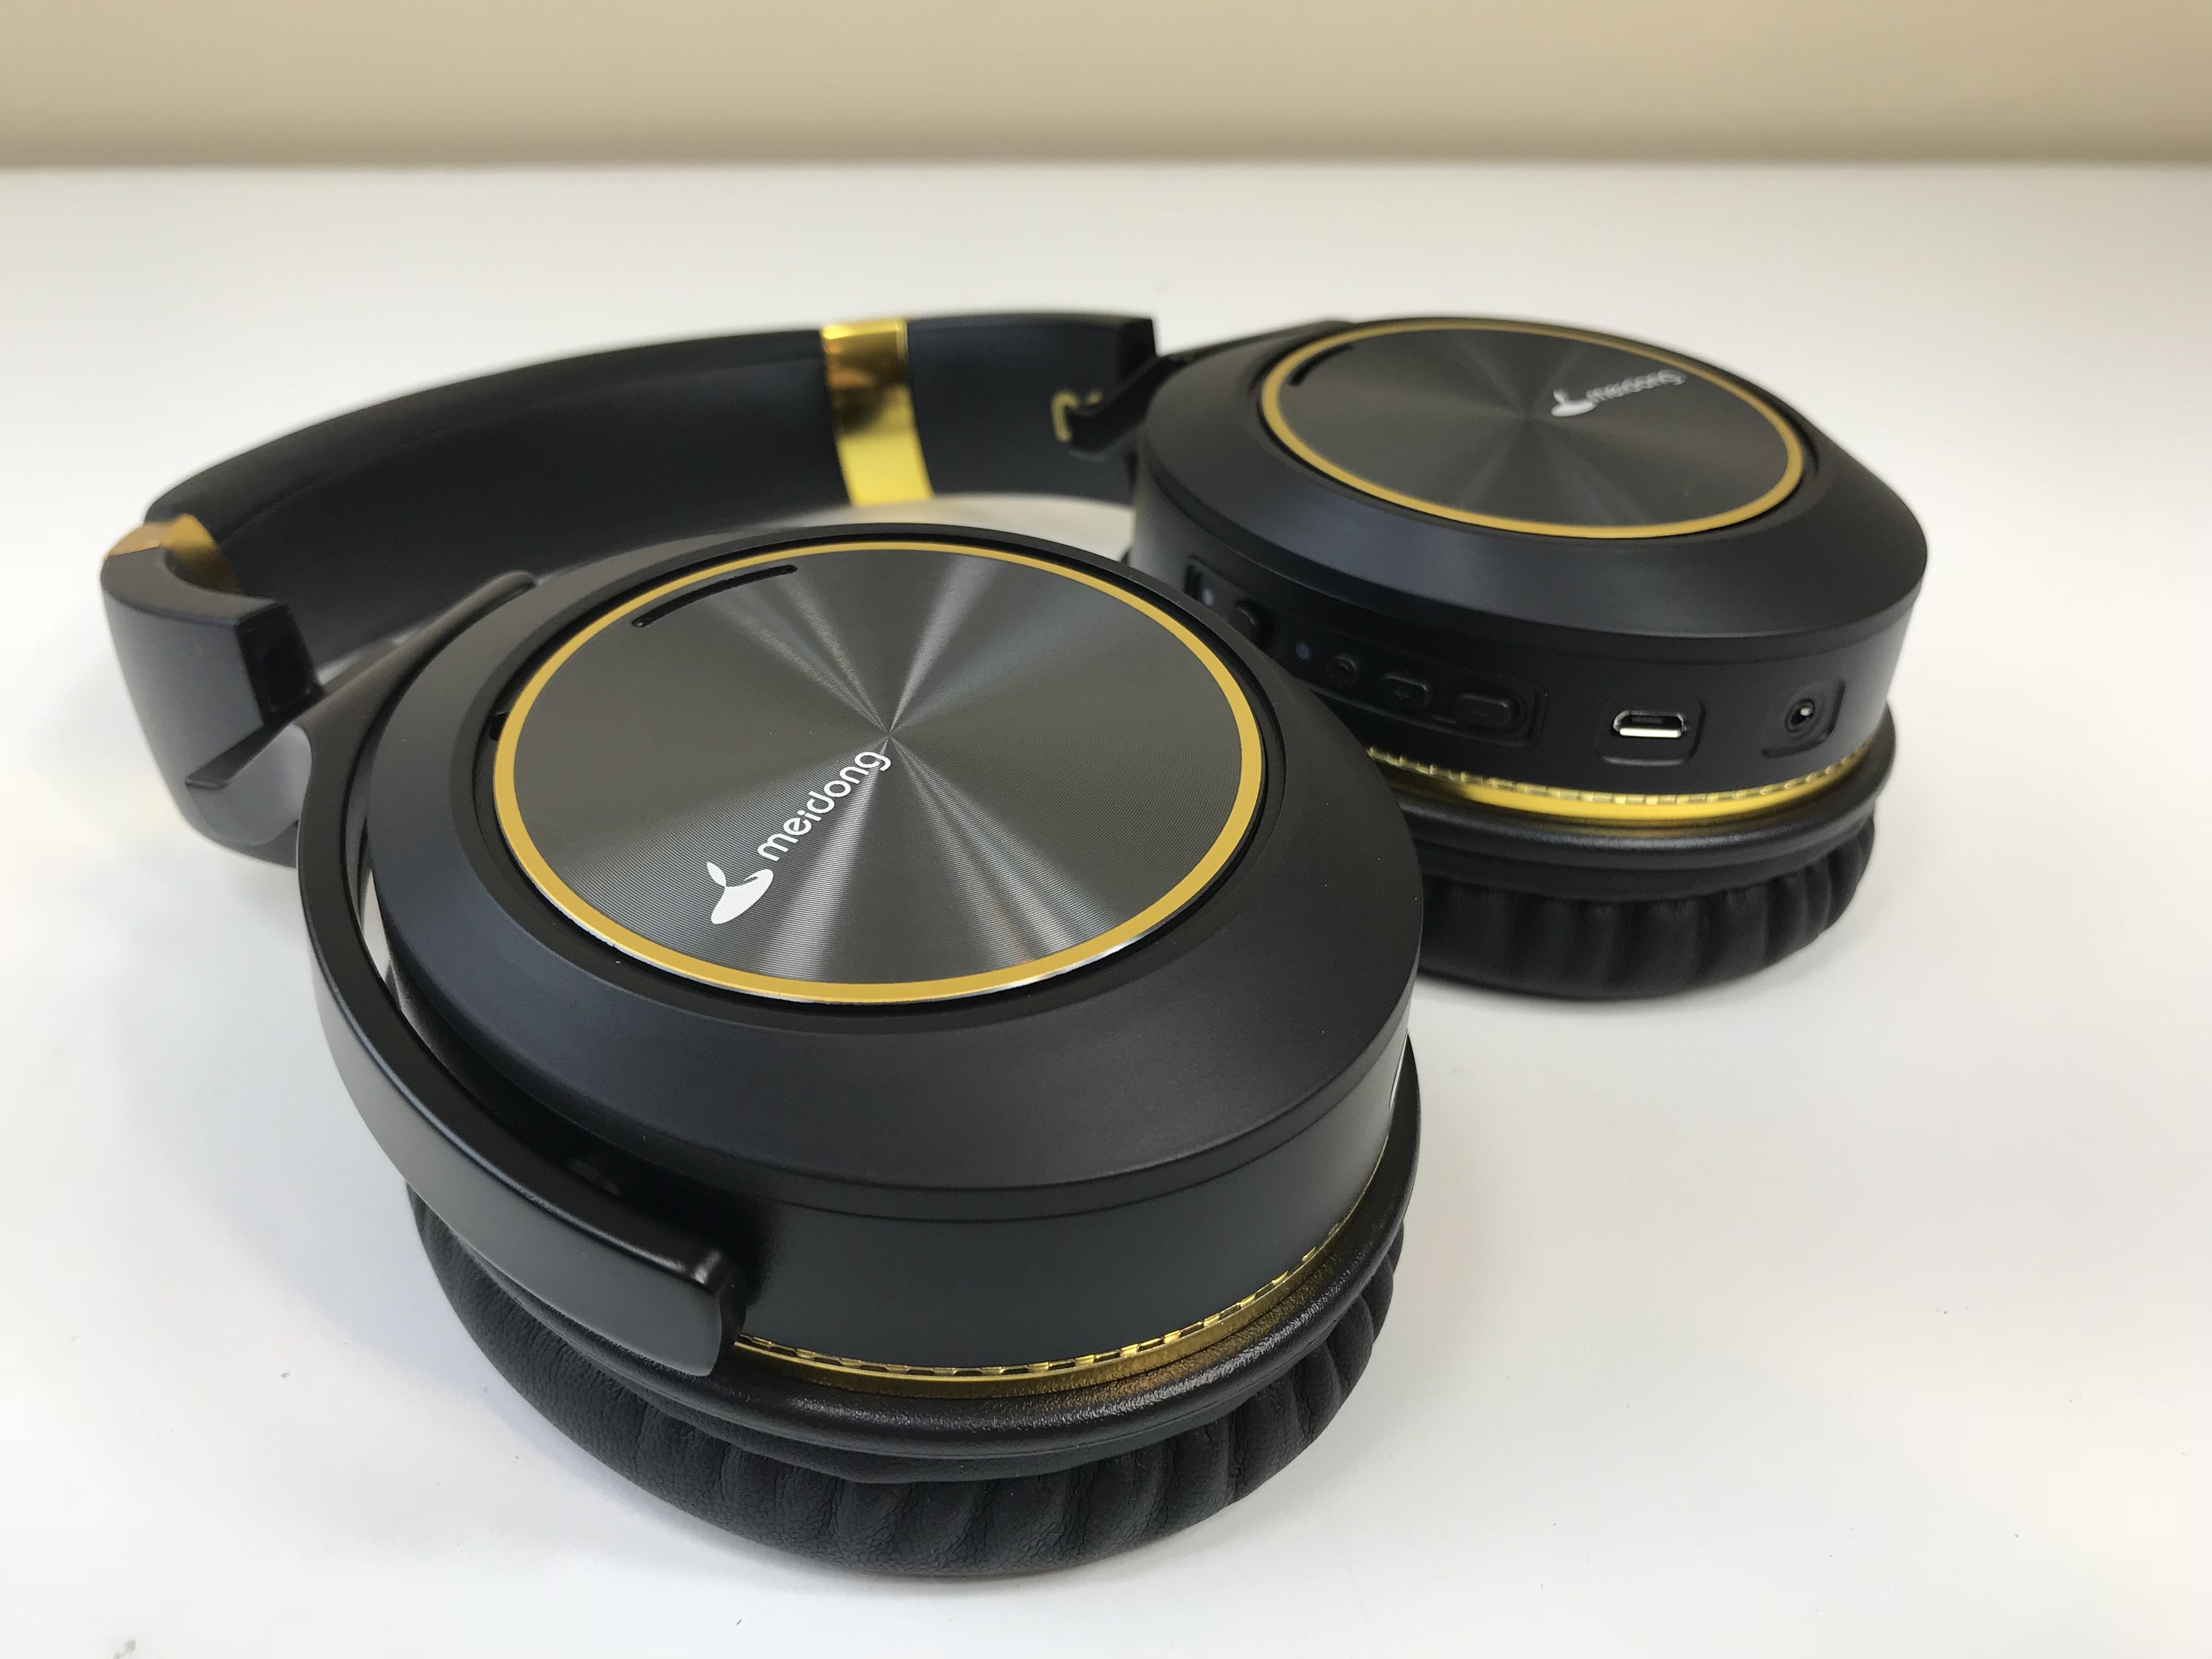 Meidong E8 Noise Cancelling Headphones ReviewJPG